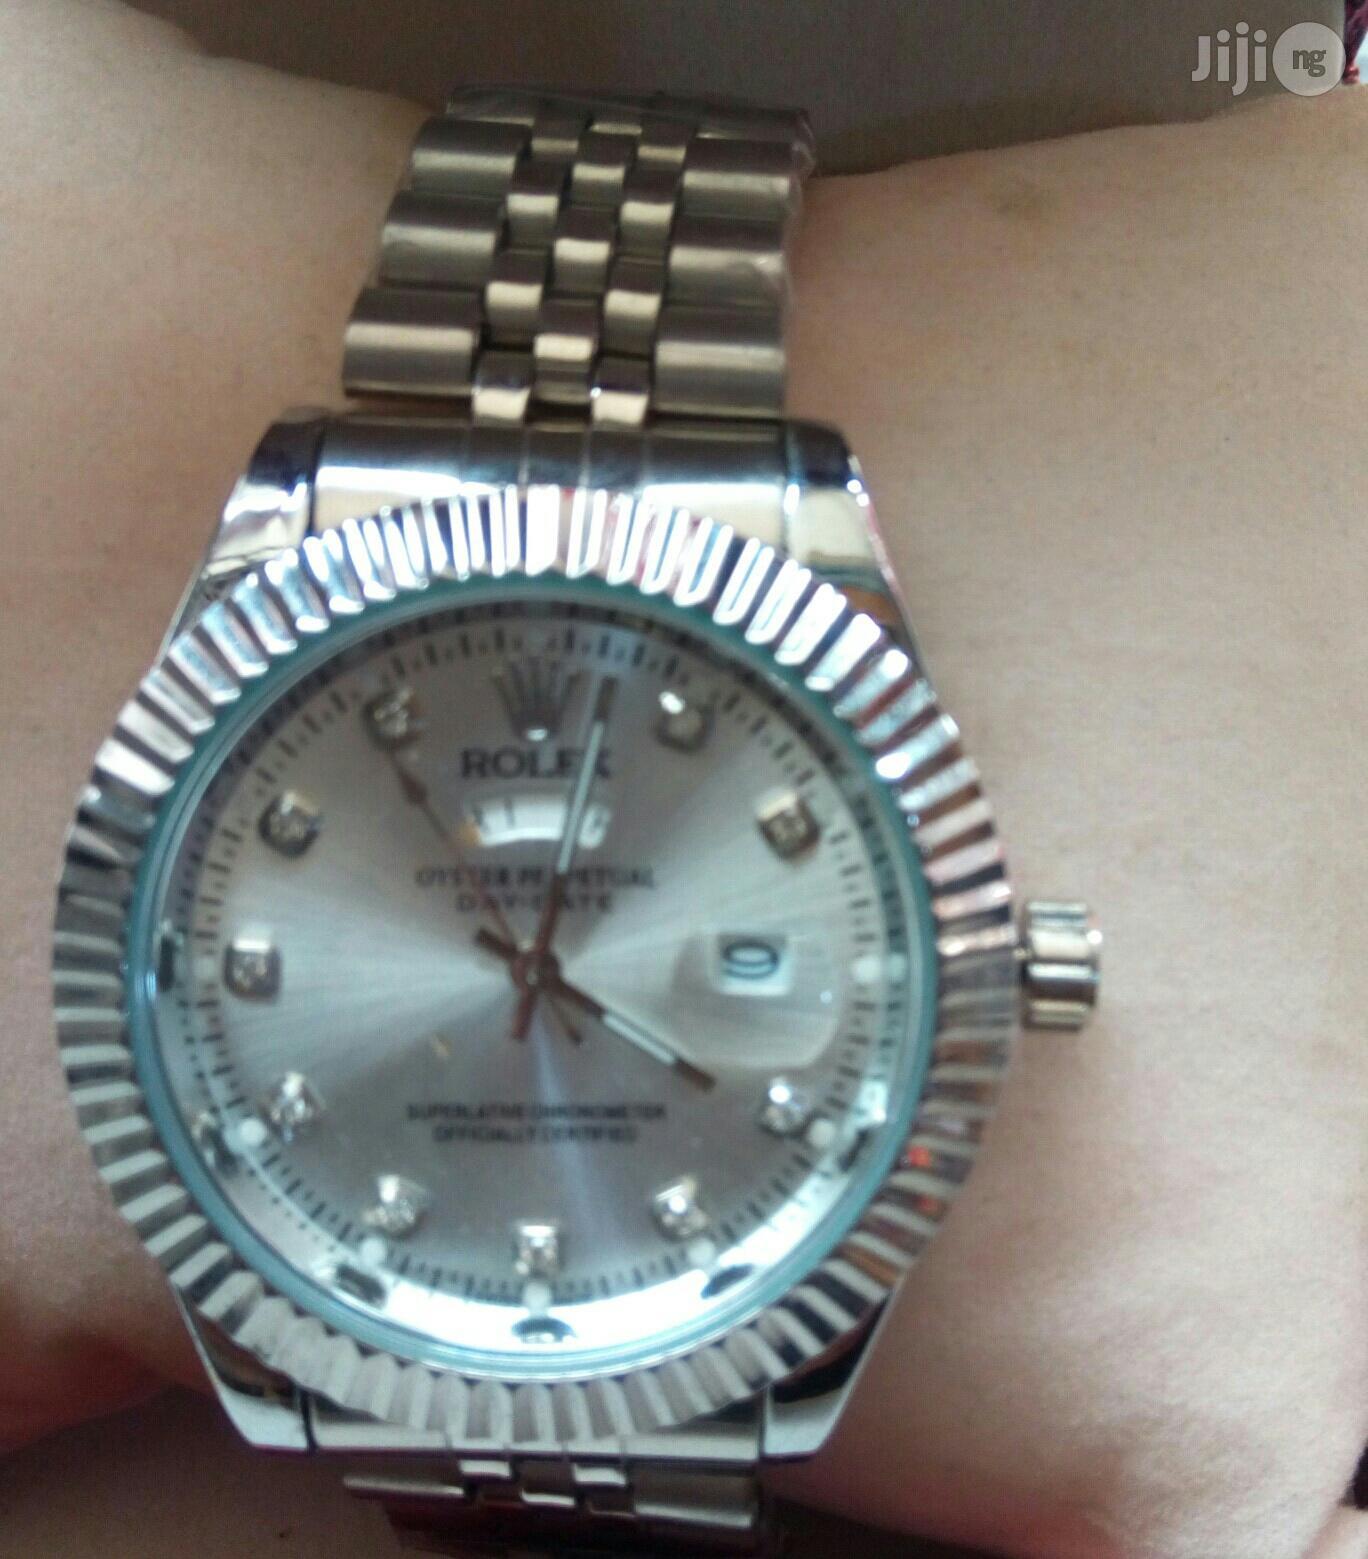 Unique Rolex Watch (Promo Price) | Watches for sale in Lagos State, Nigeria